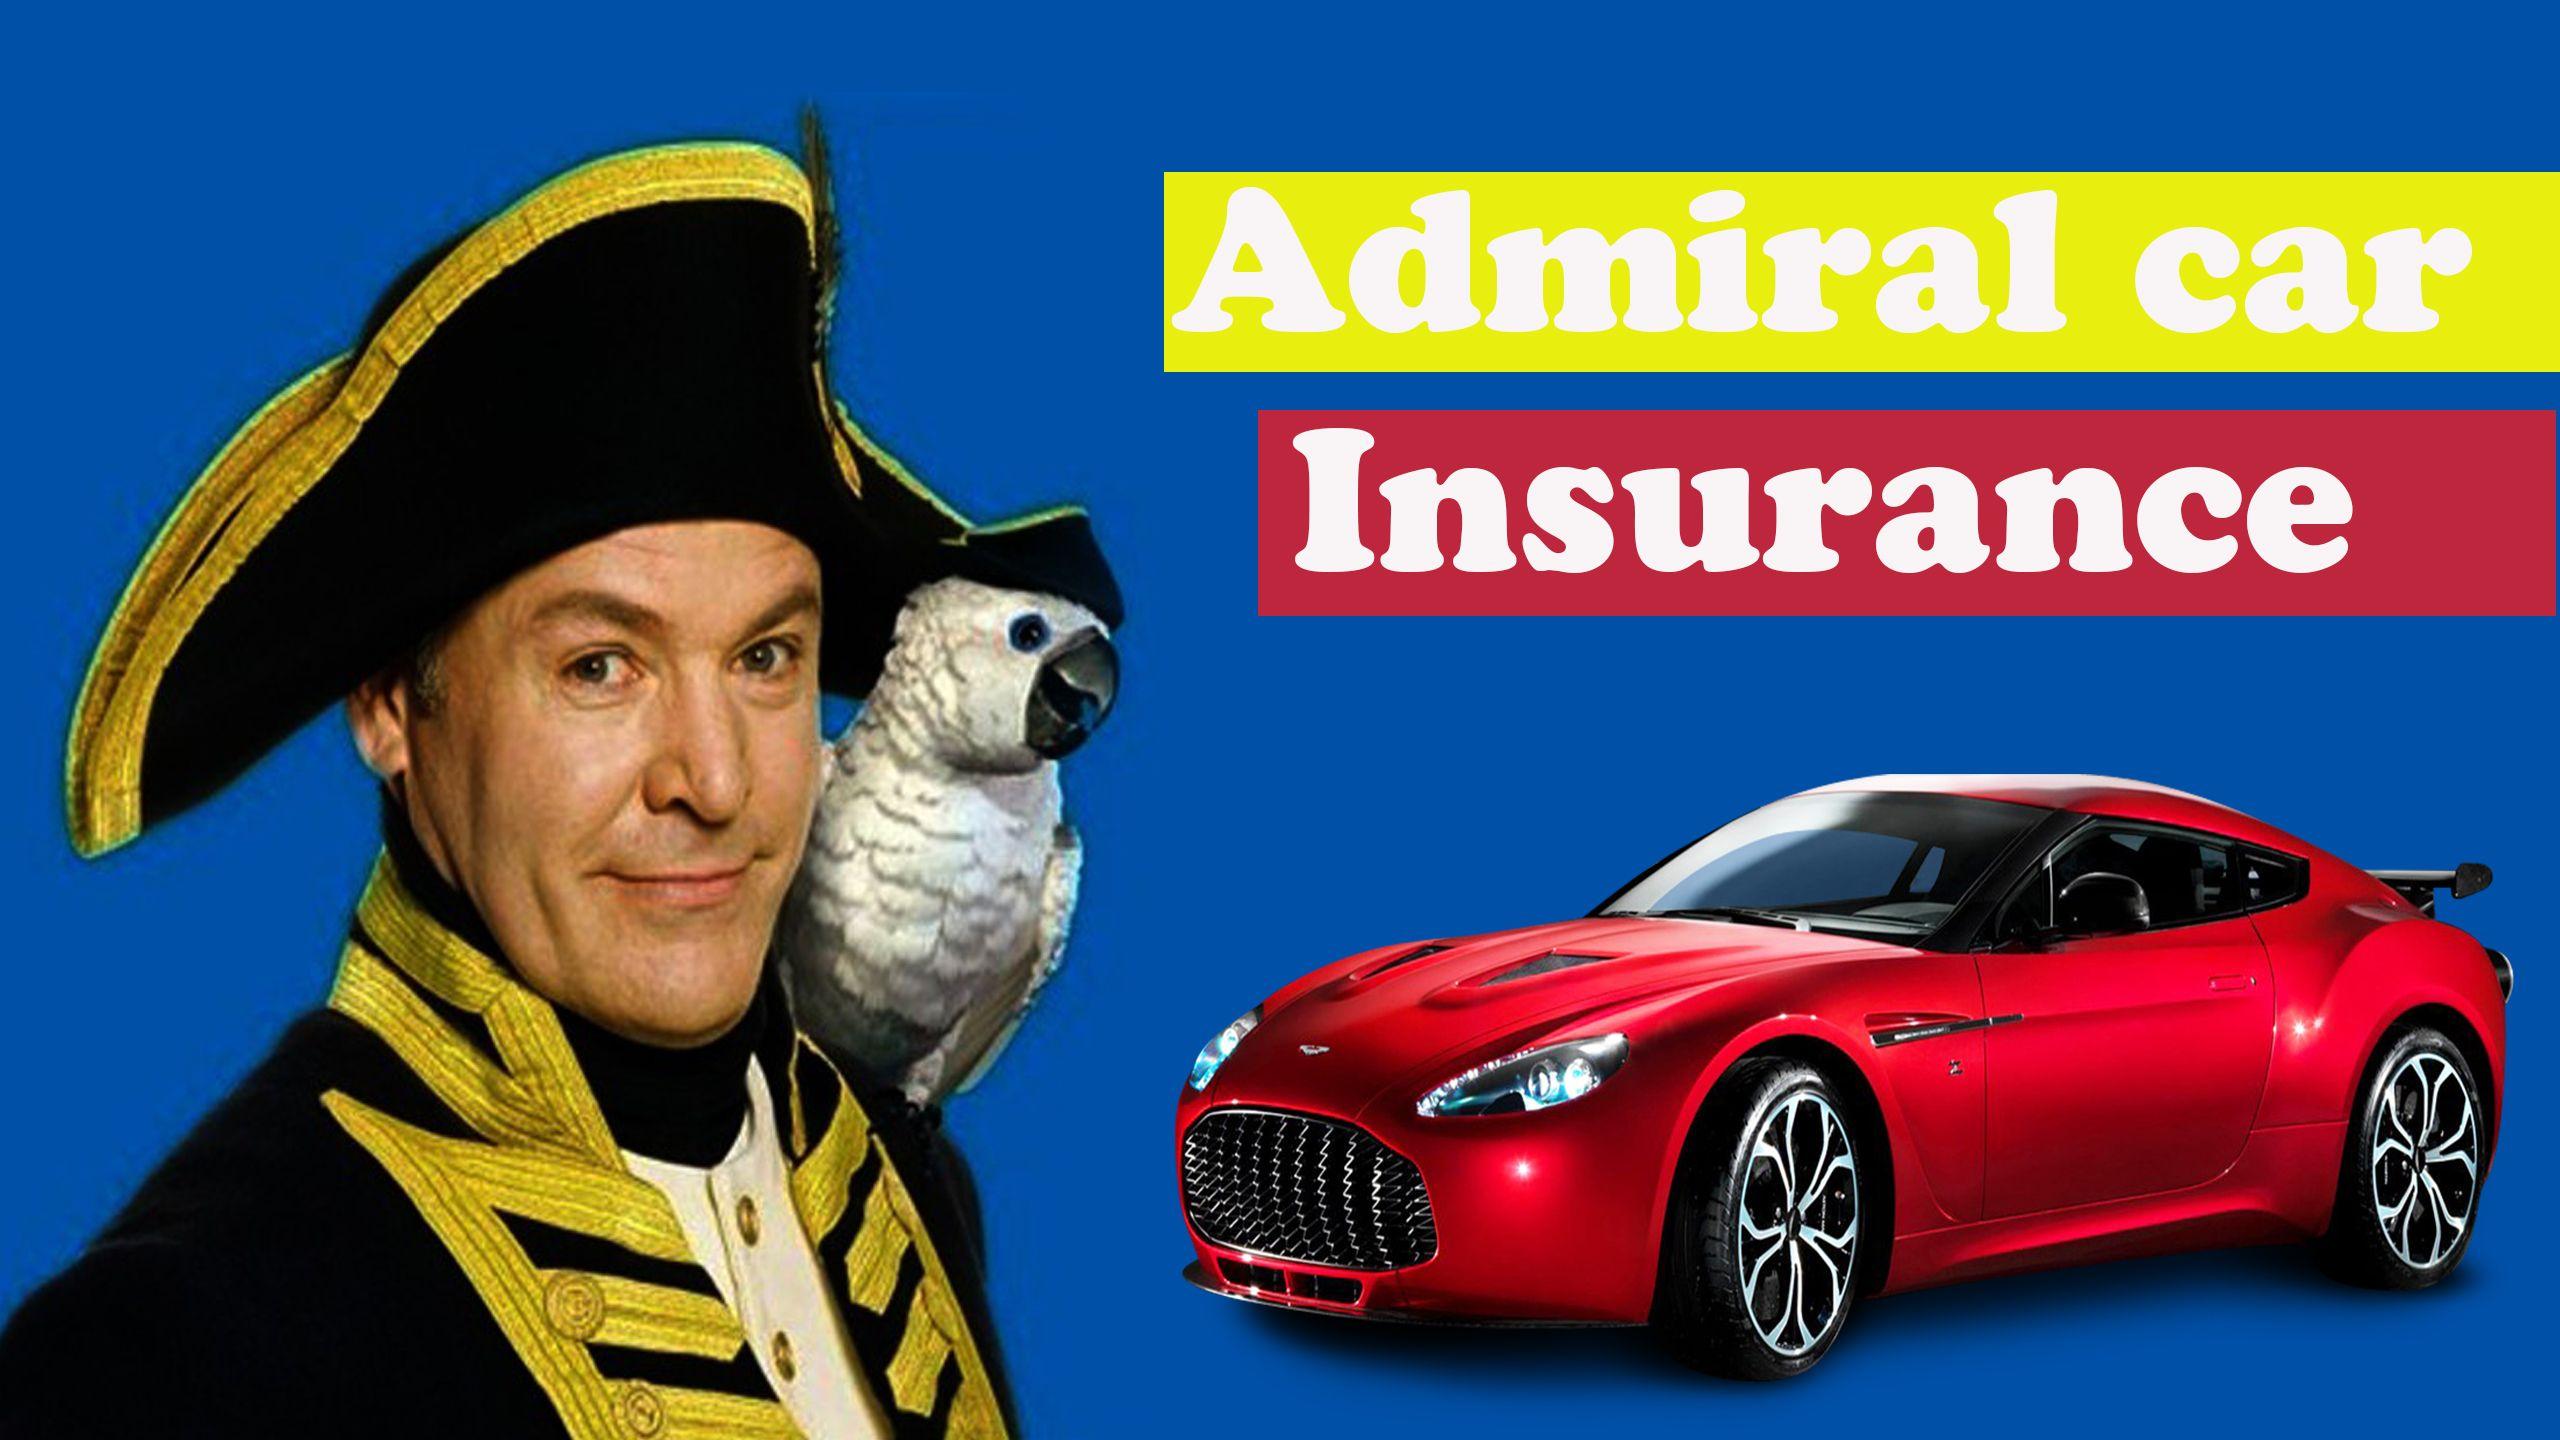 How good is admiral car insurance | Car insurance, Best ...